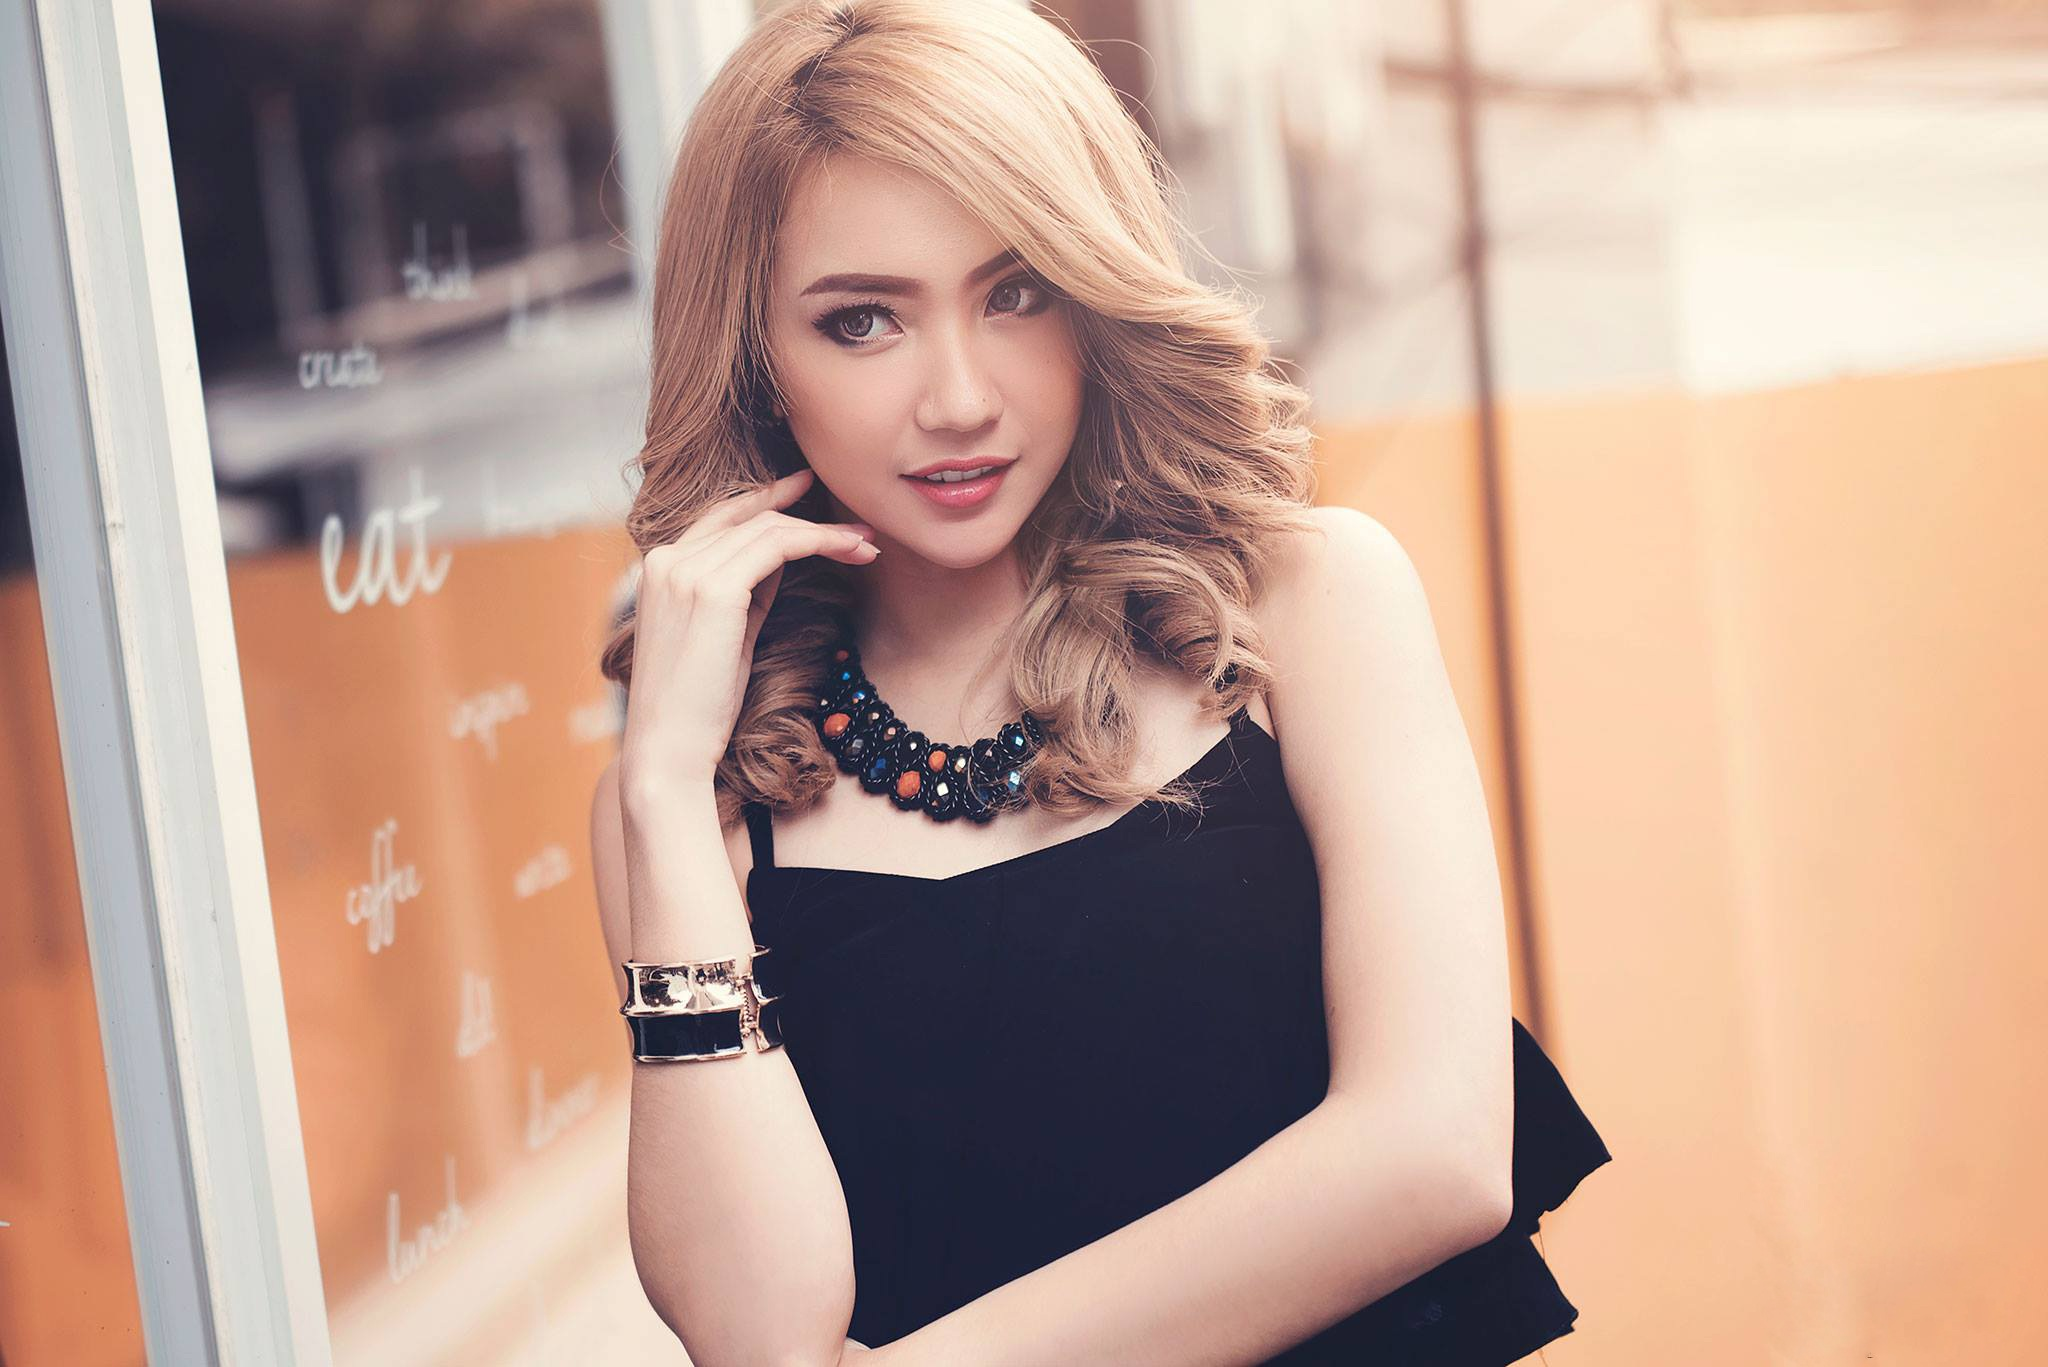 Coafuri par mediu - sfatulparintilor.ro - pixabay_com - woman-1477091